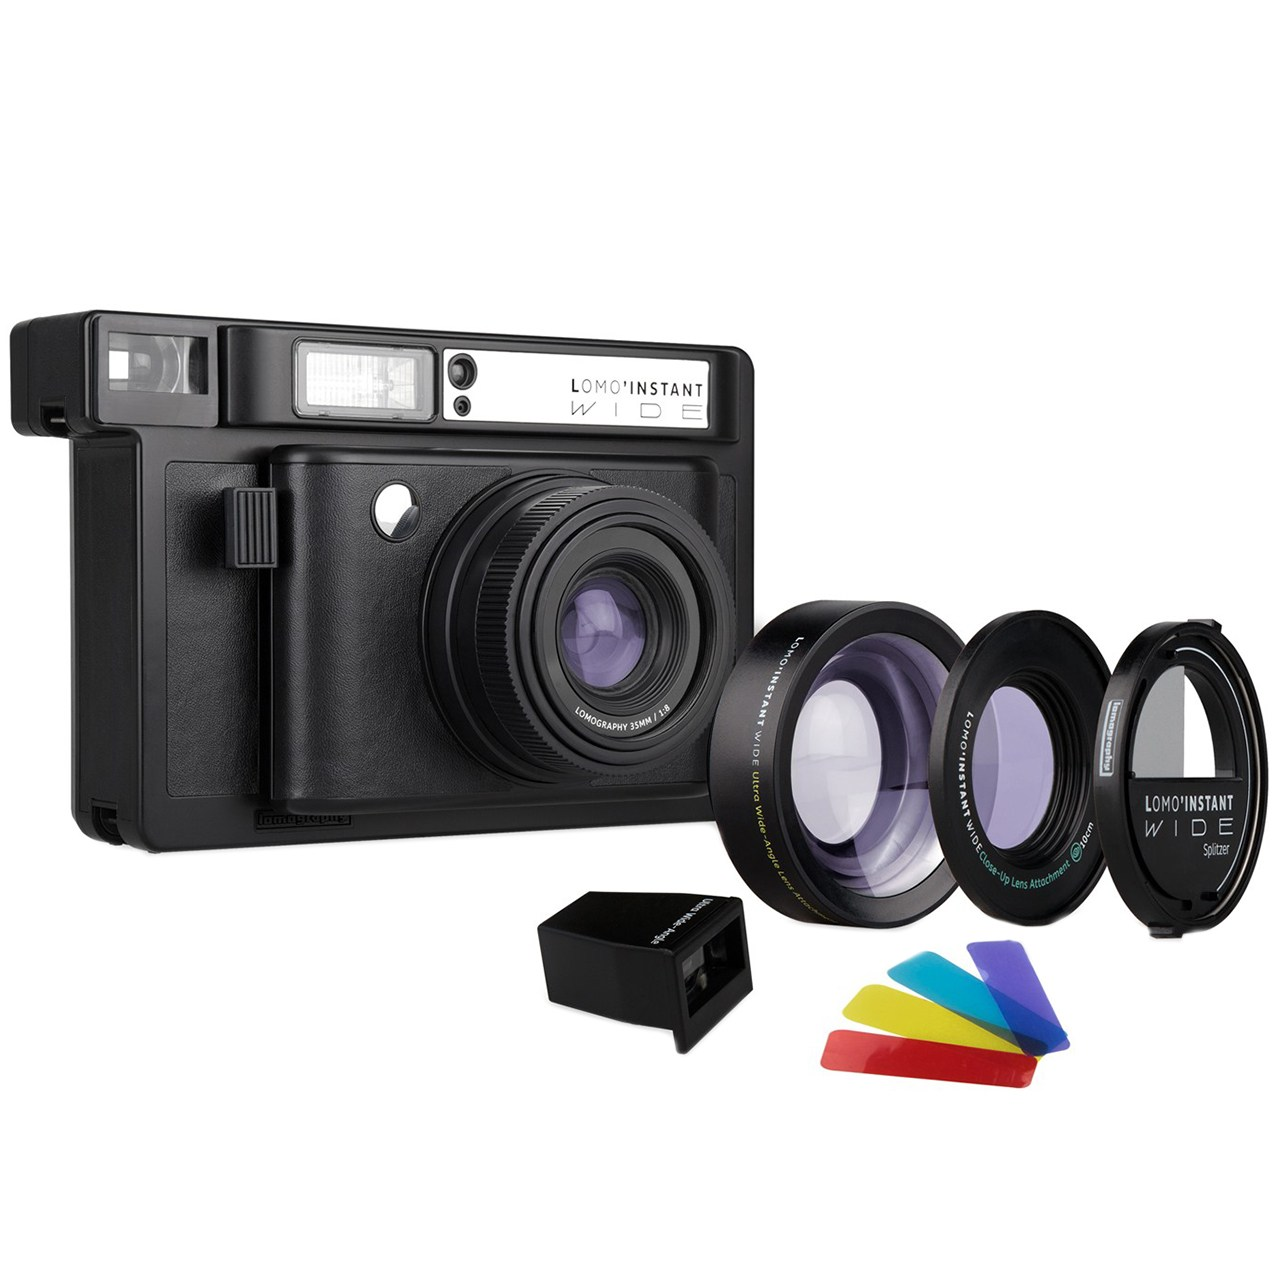 دوربین چاپ سریع لوموگرافی مدل Wide Black به همراه دو لنز